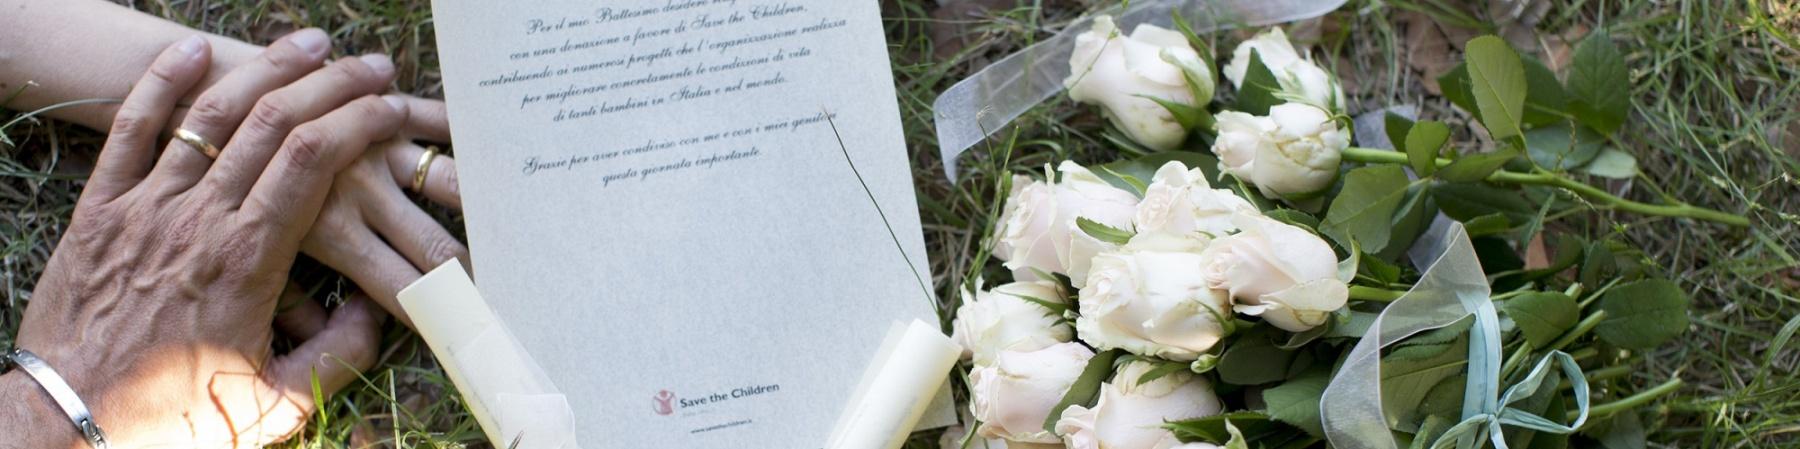 Lista nozze testimonianza